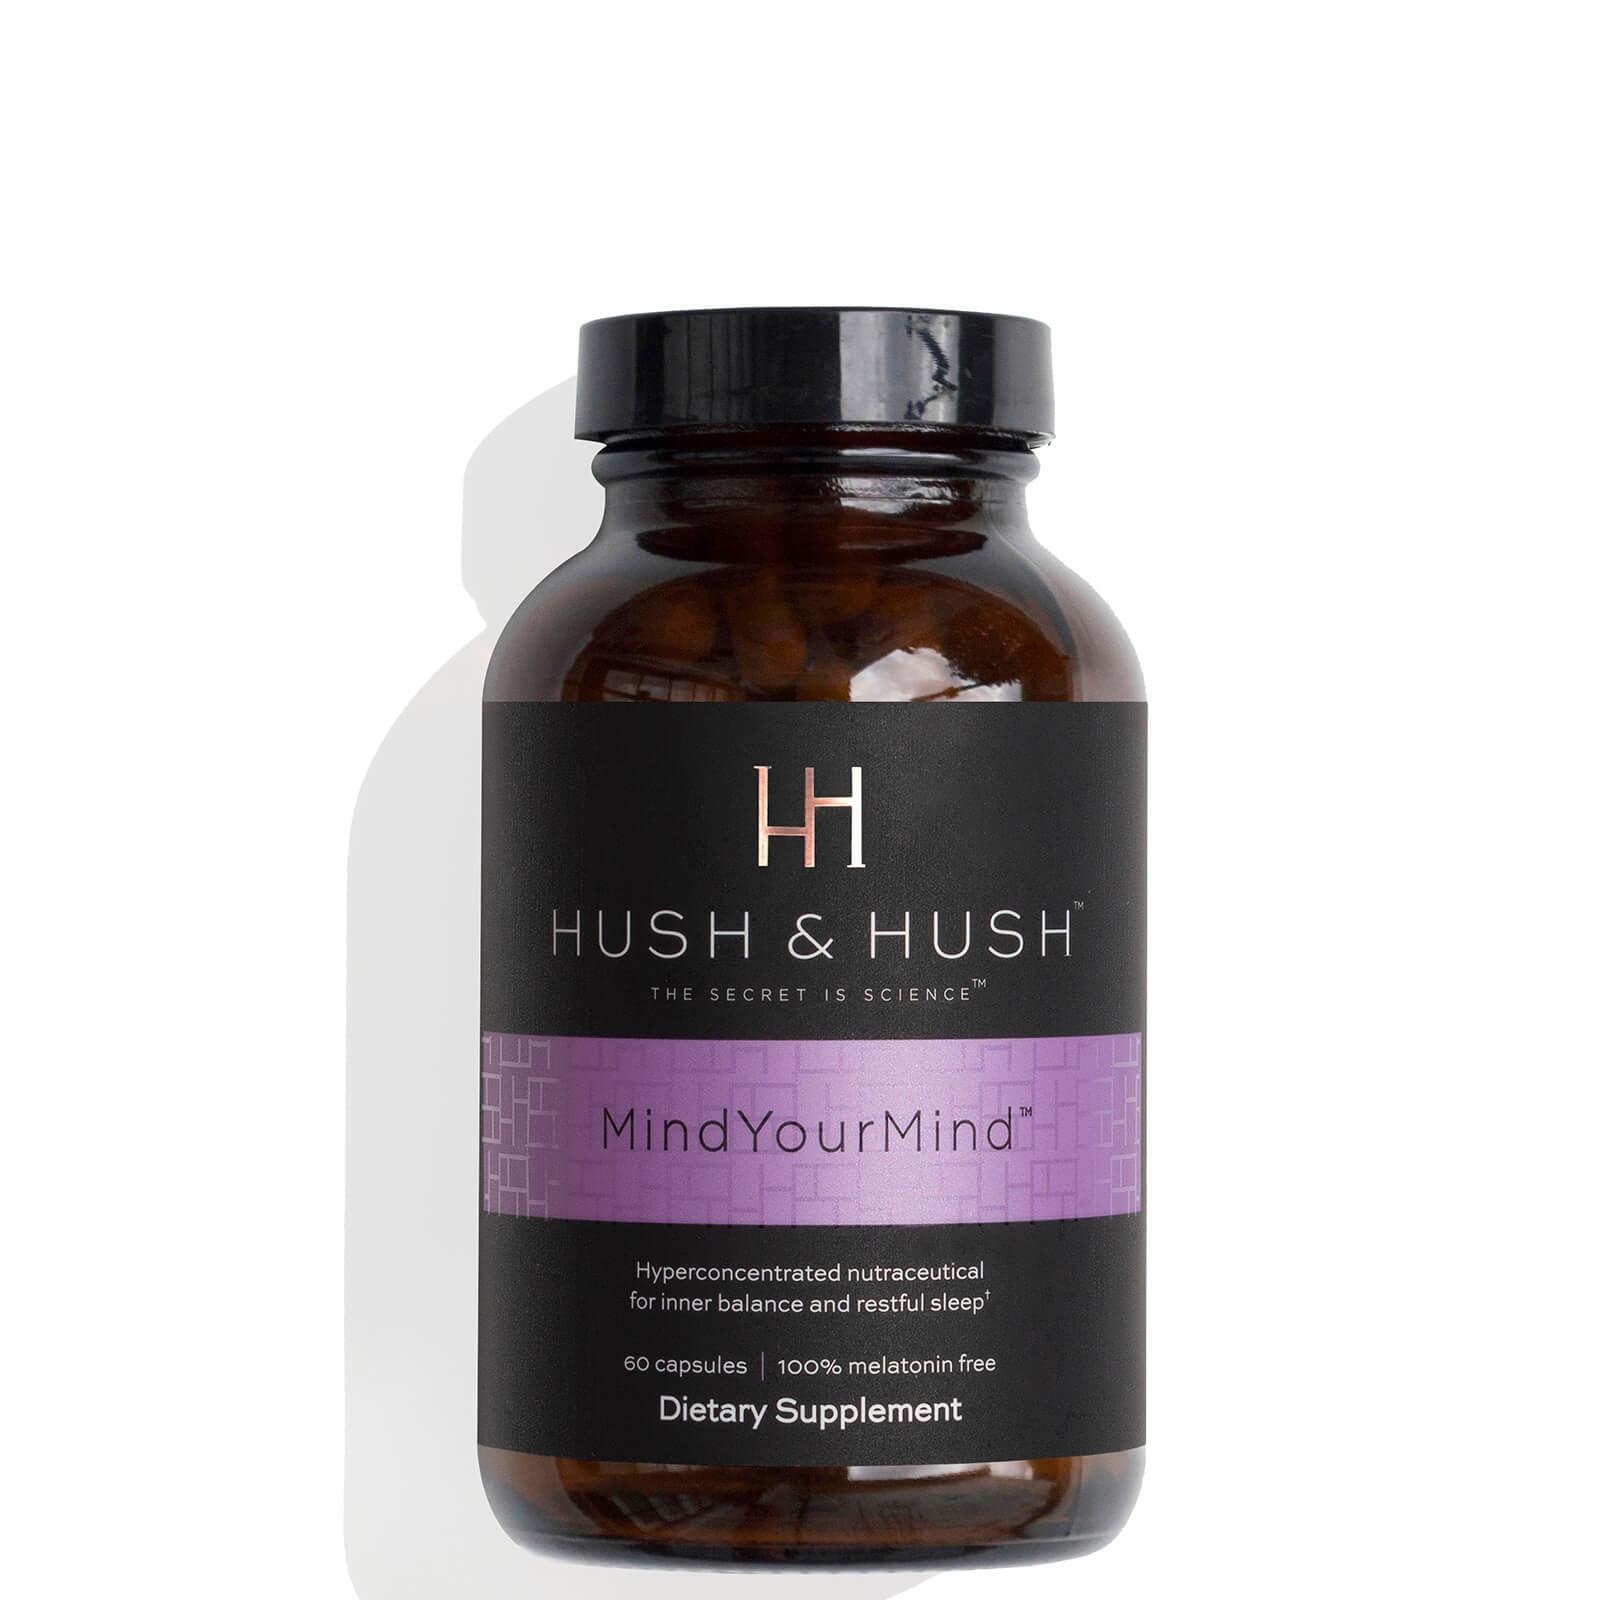 Hush & Hush MindYourMind® Sleep Supplement 60 Capsules